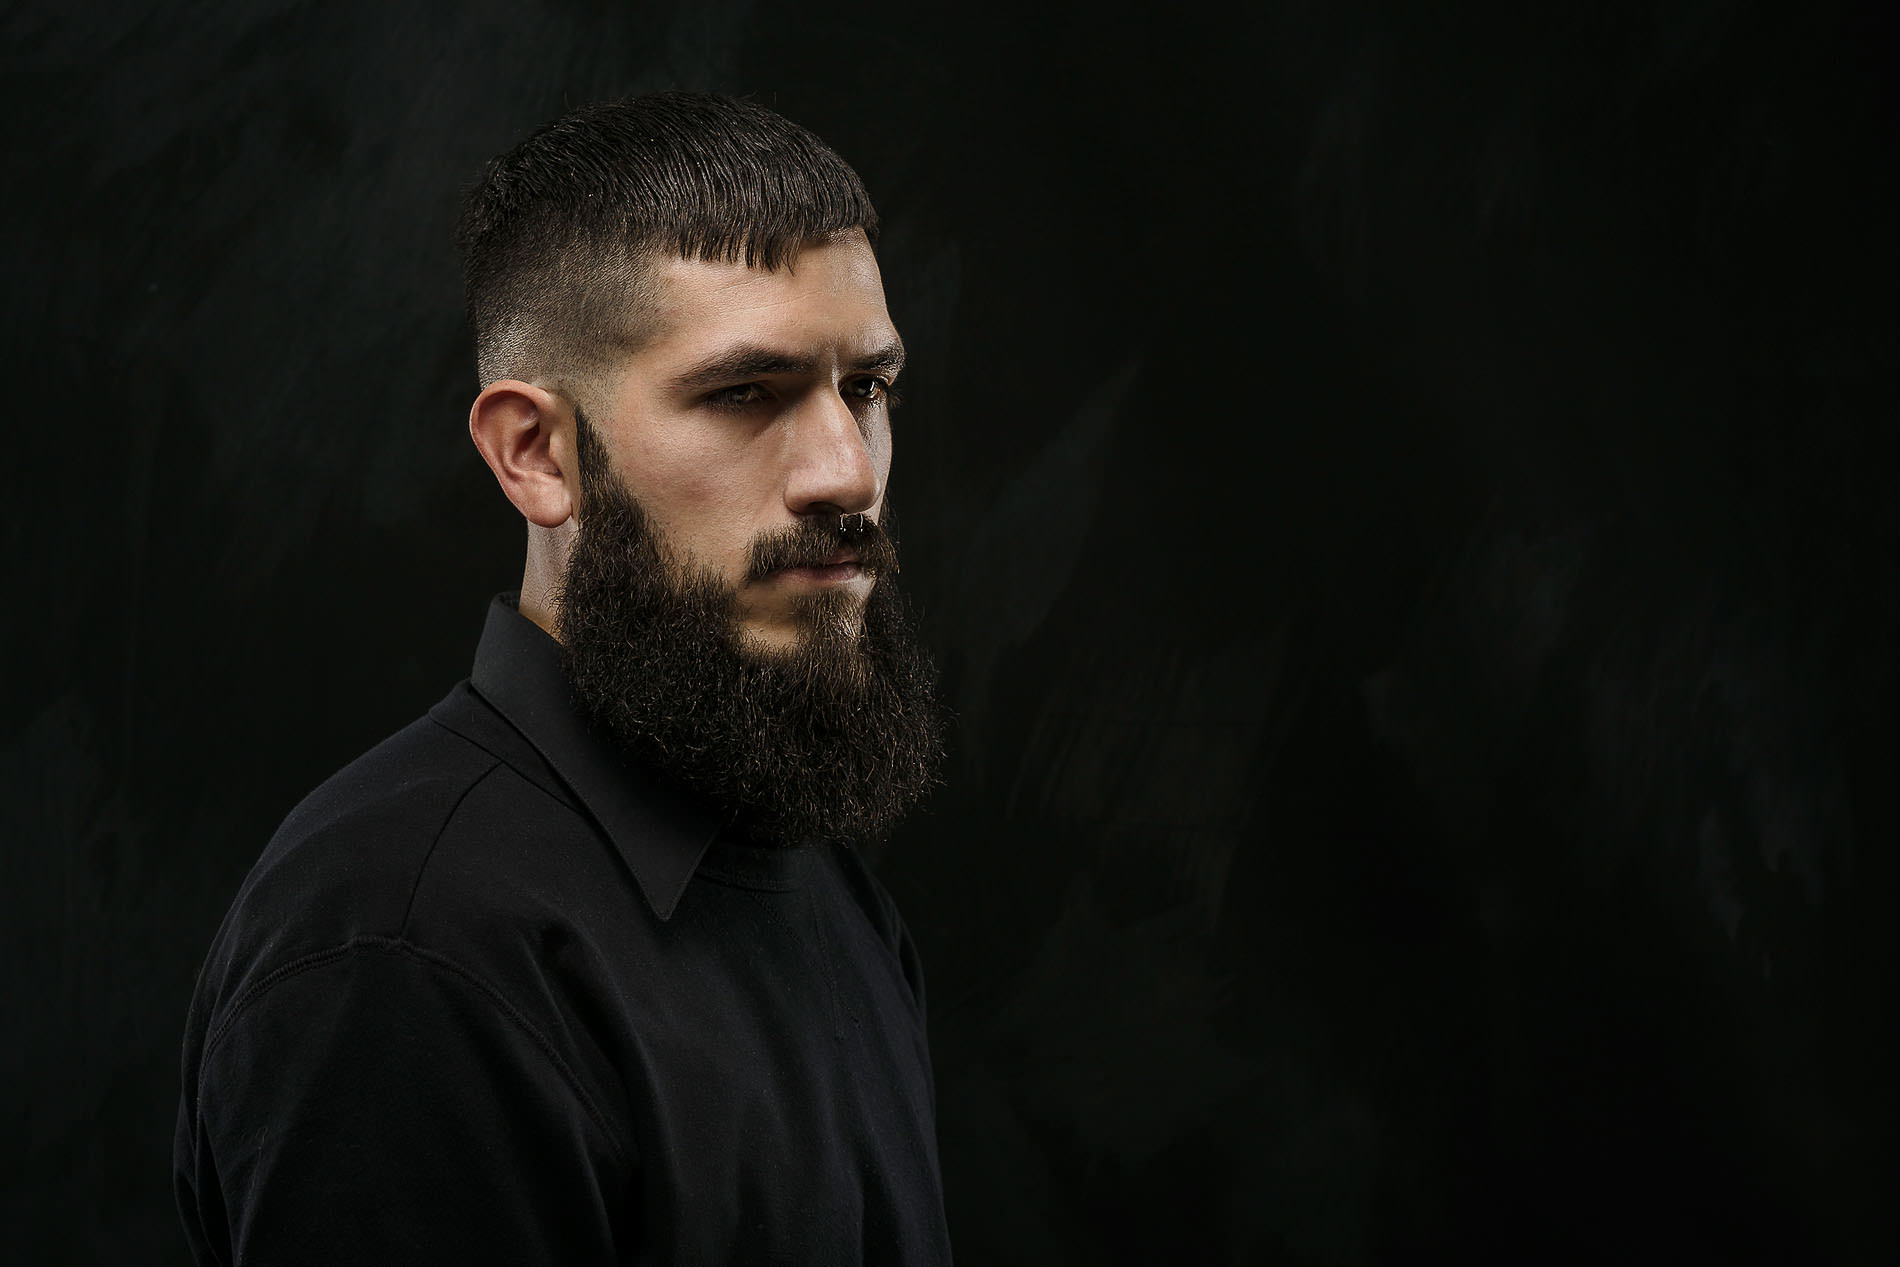 marcosvaldeés|FOTÓGRAFO® portrait photographer